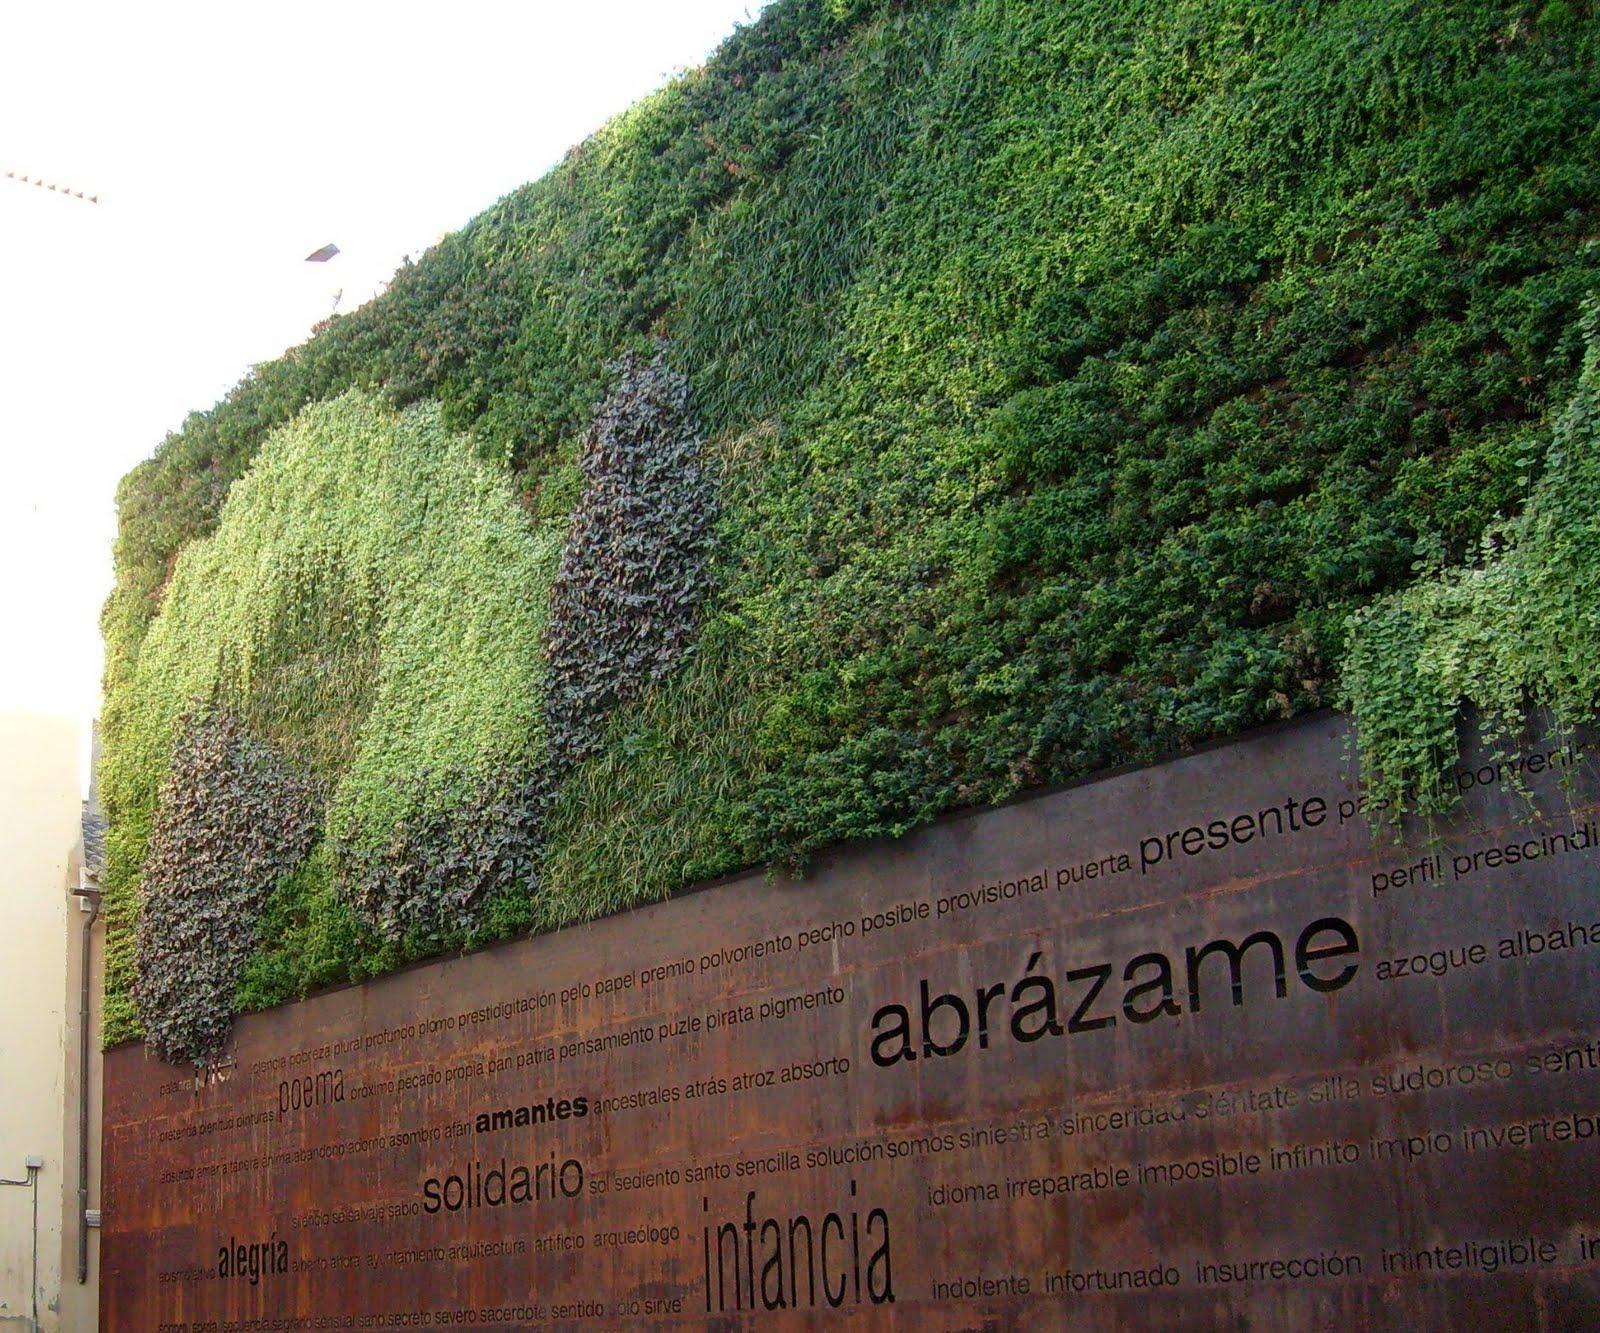 Cultura de sevilla jardines verticales una apuesta de futuro - Jardines verticales sevilla ...